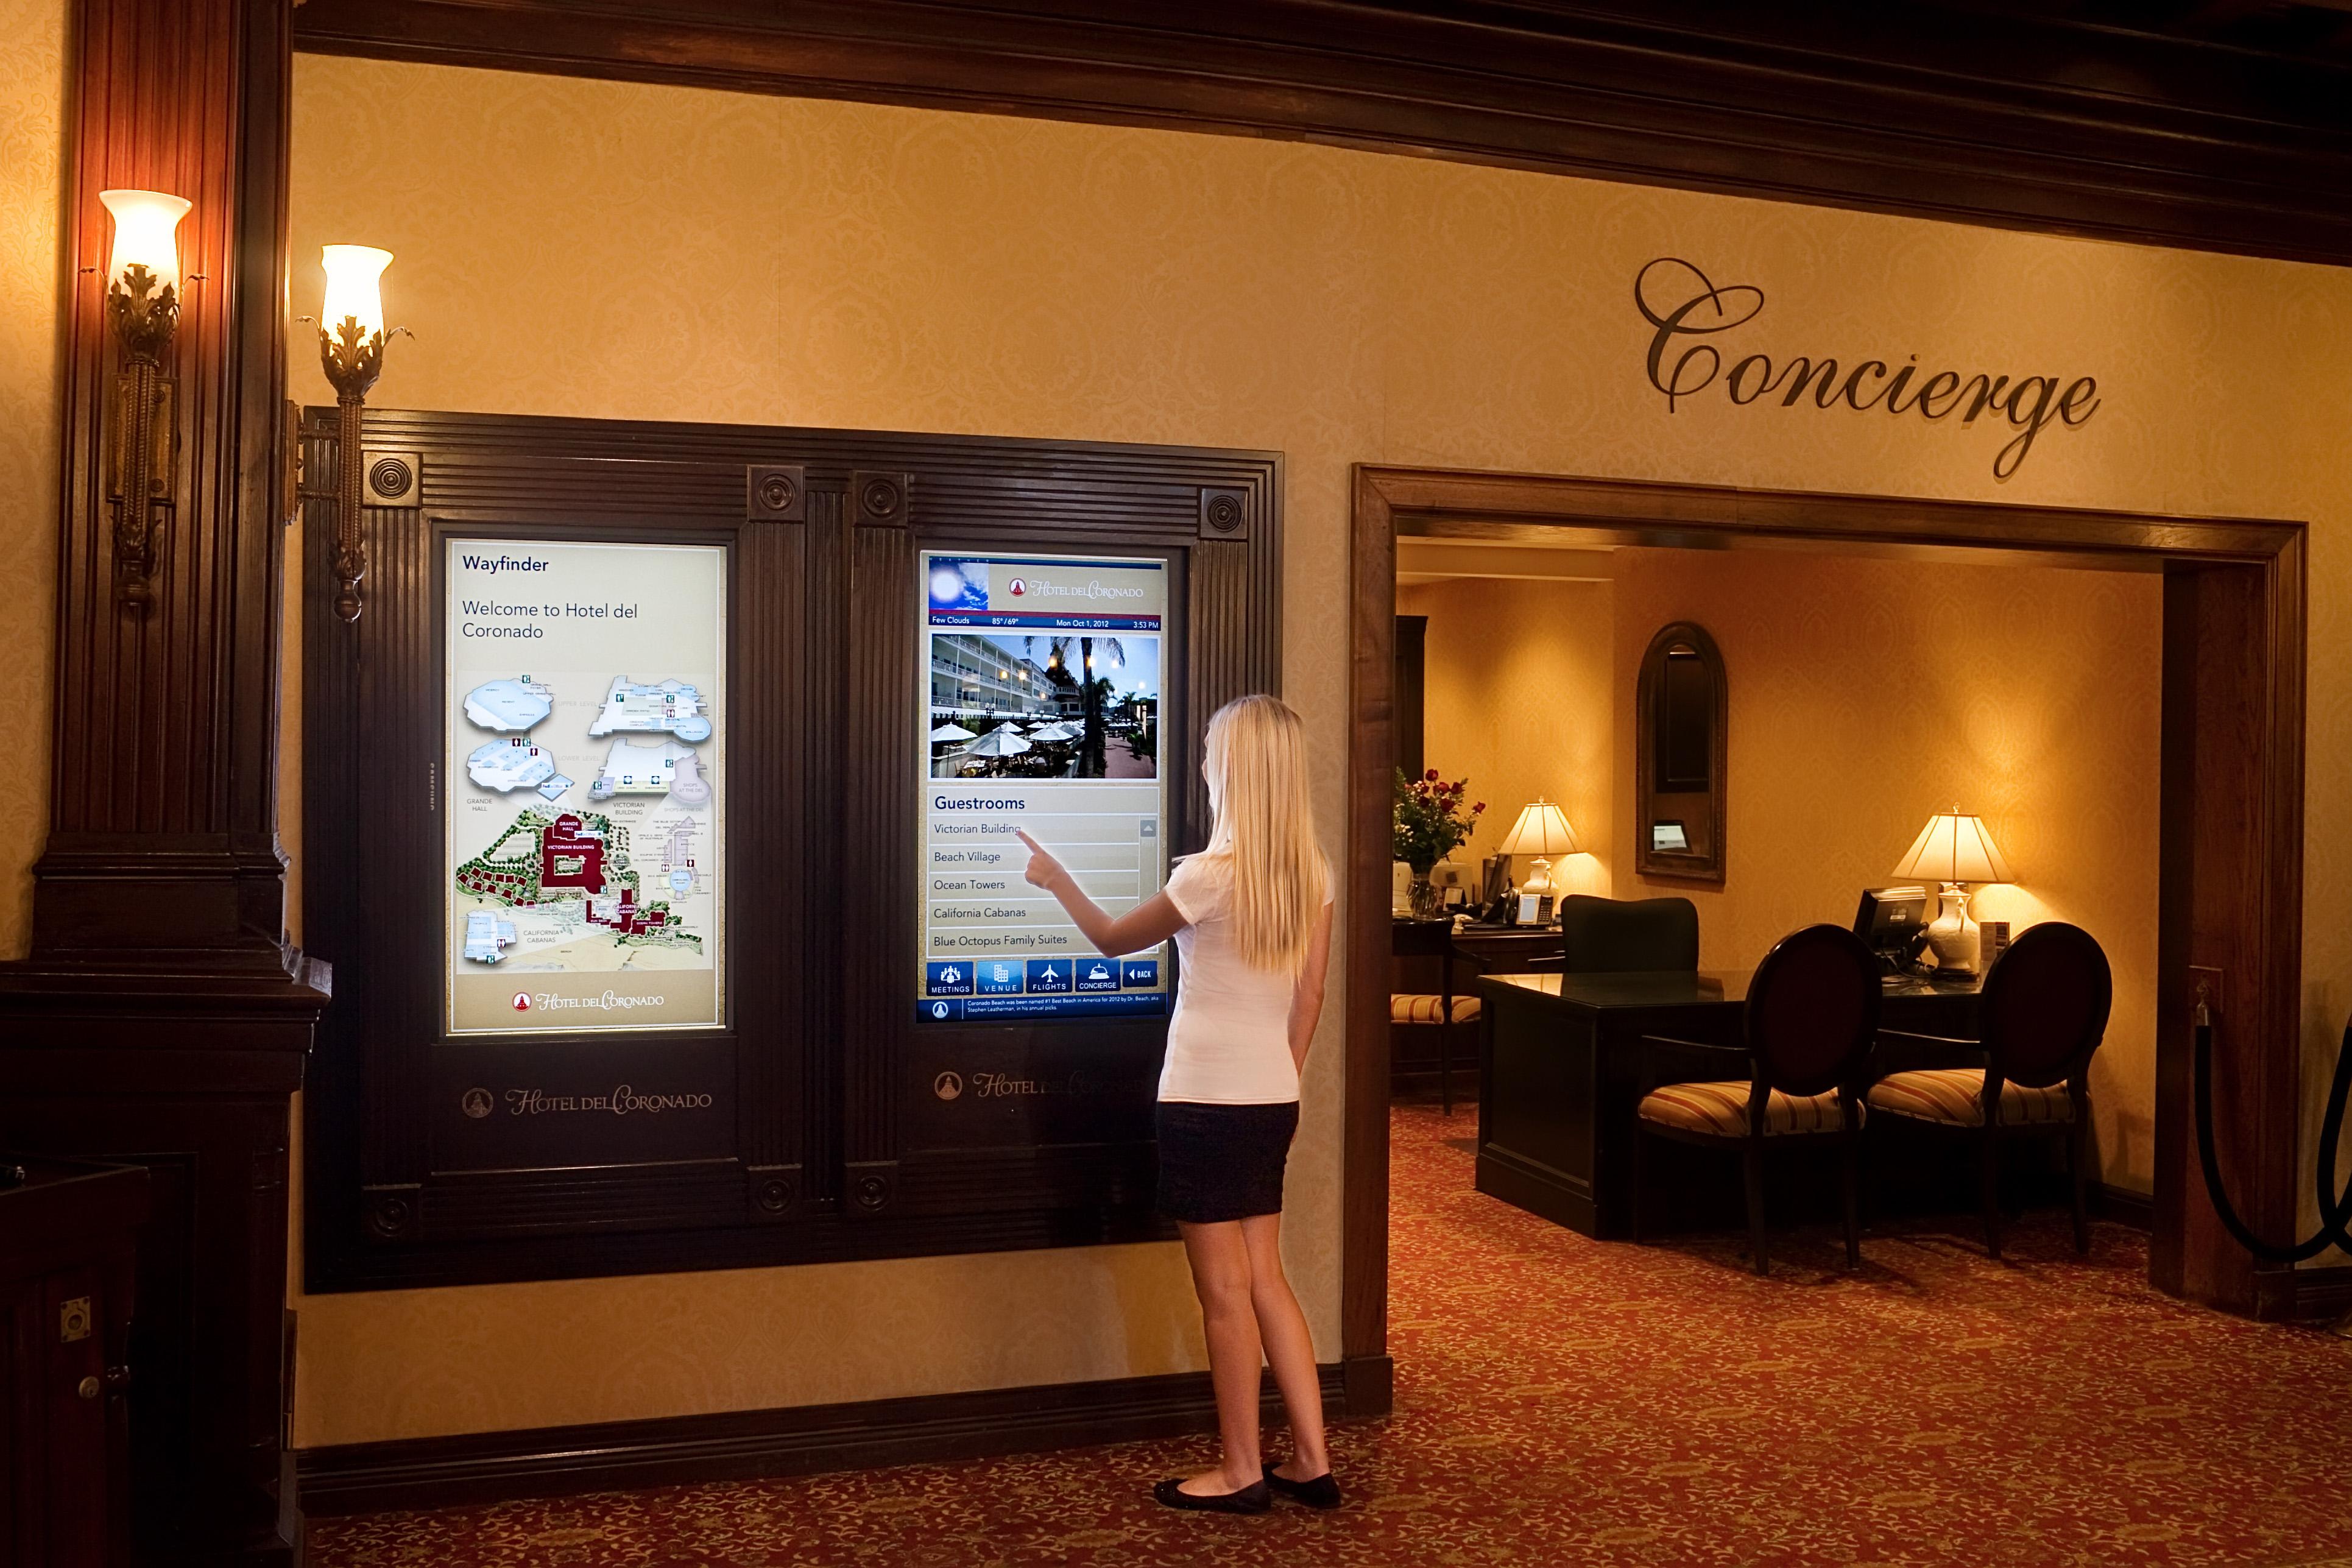 hotel digital signage solutions